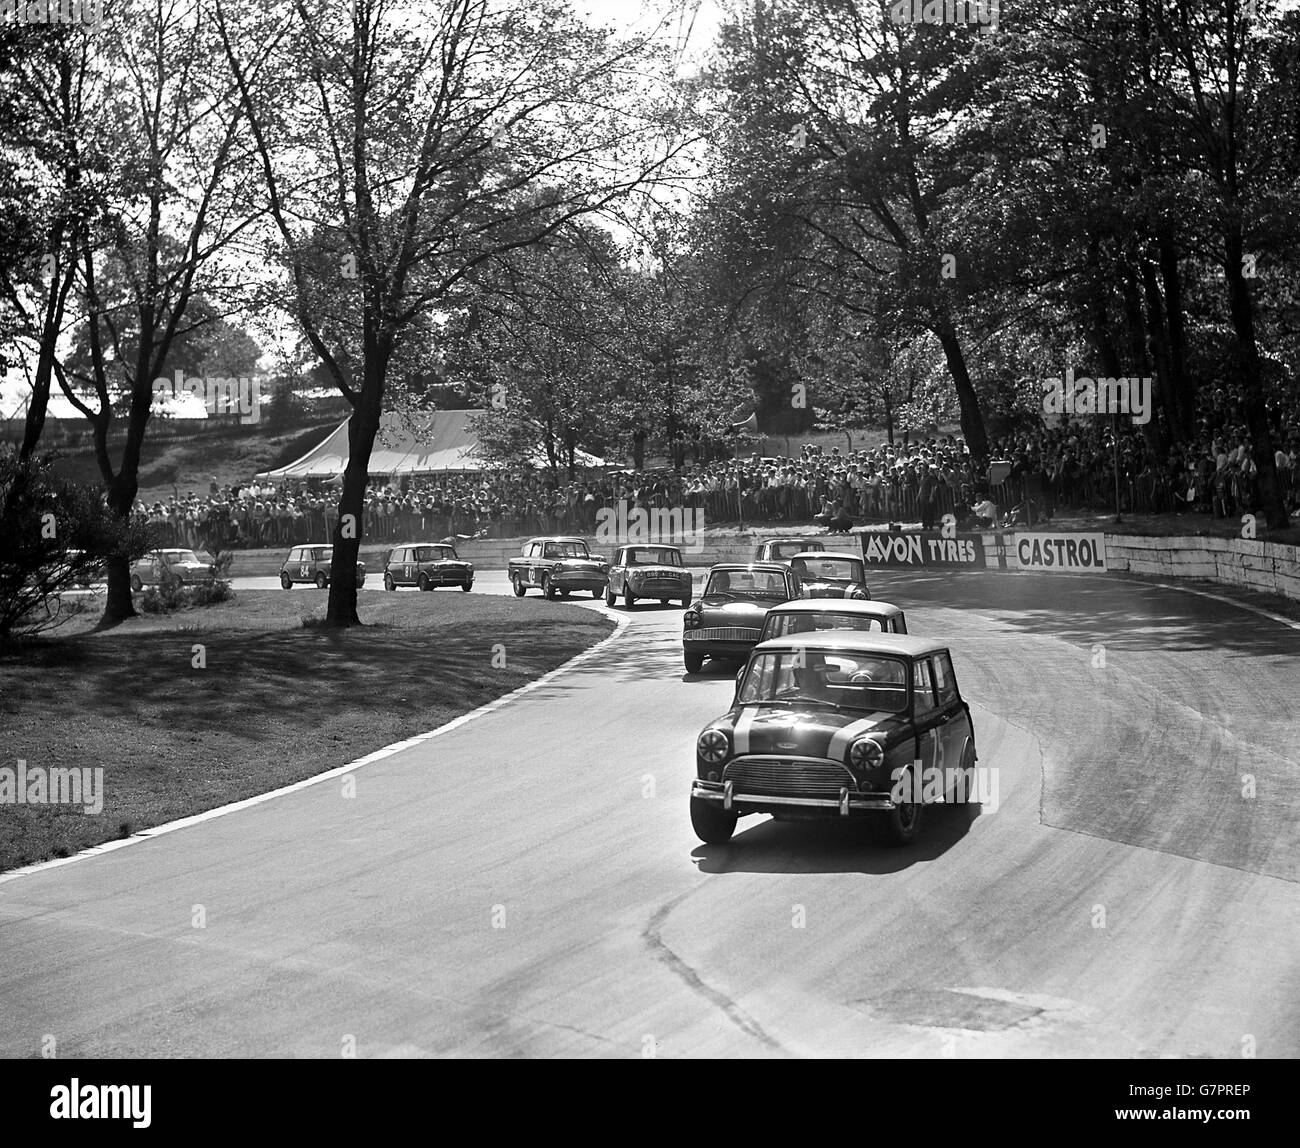 British automobile racing club stock photos british for National motor club compensation plan